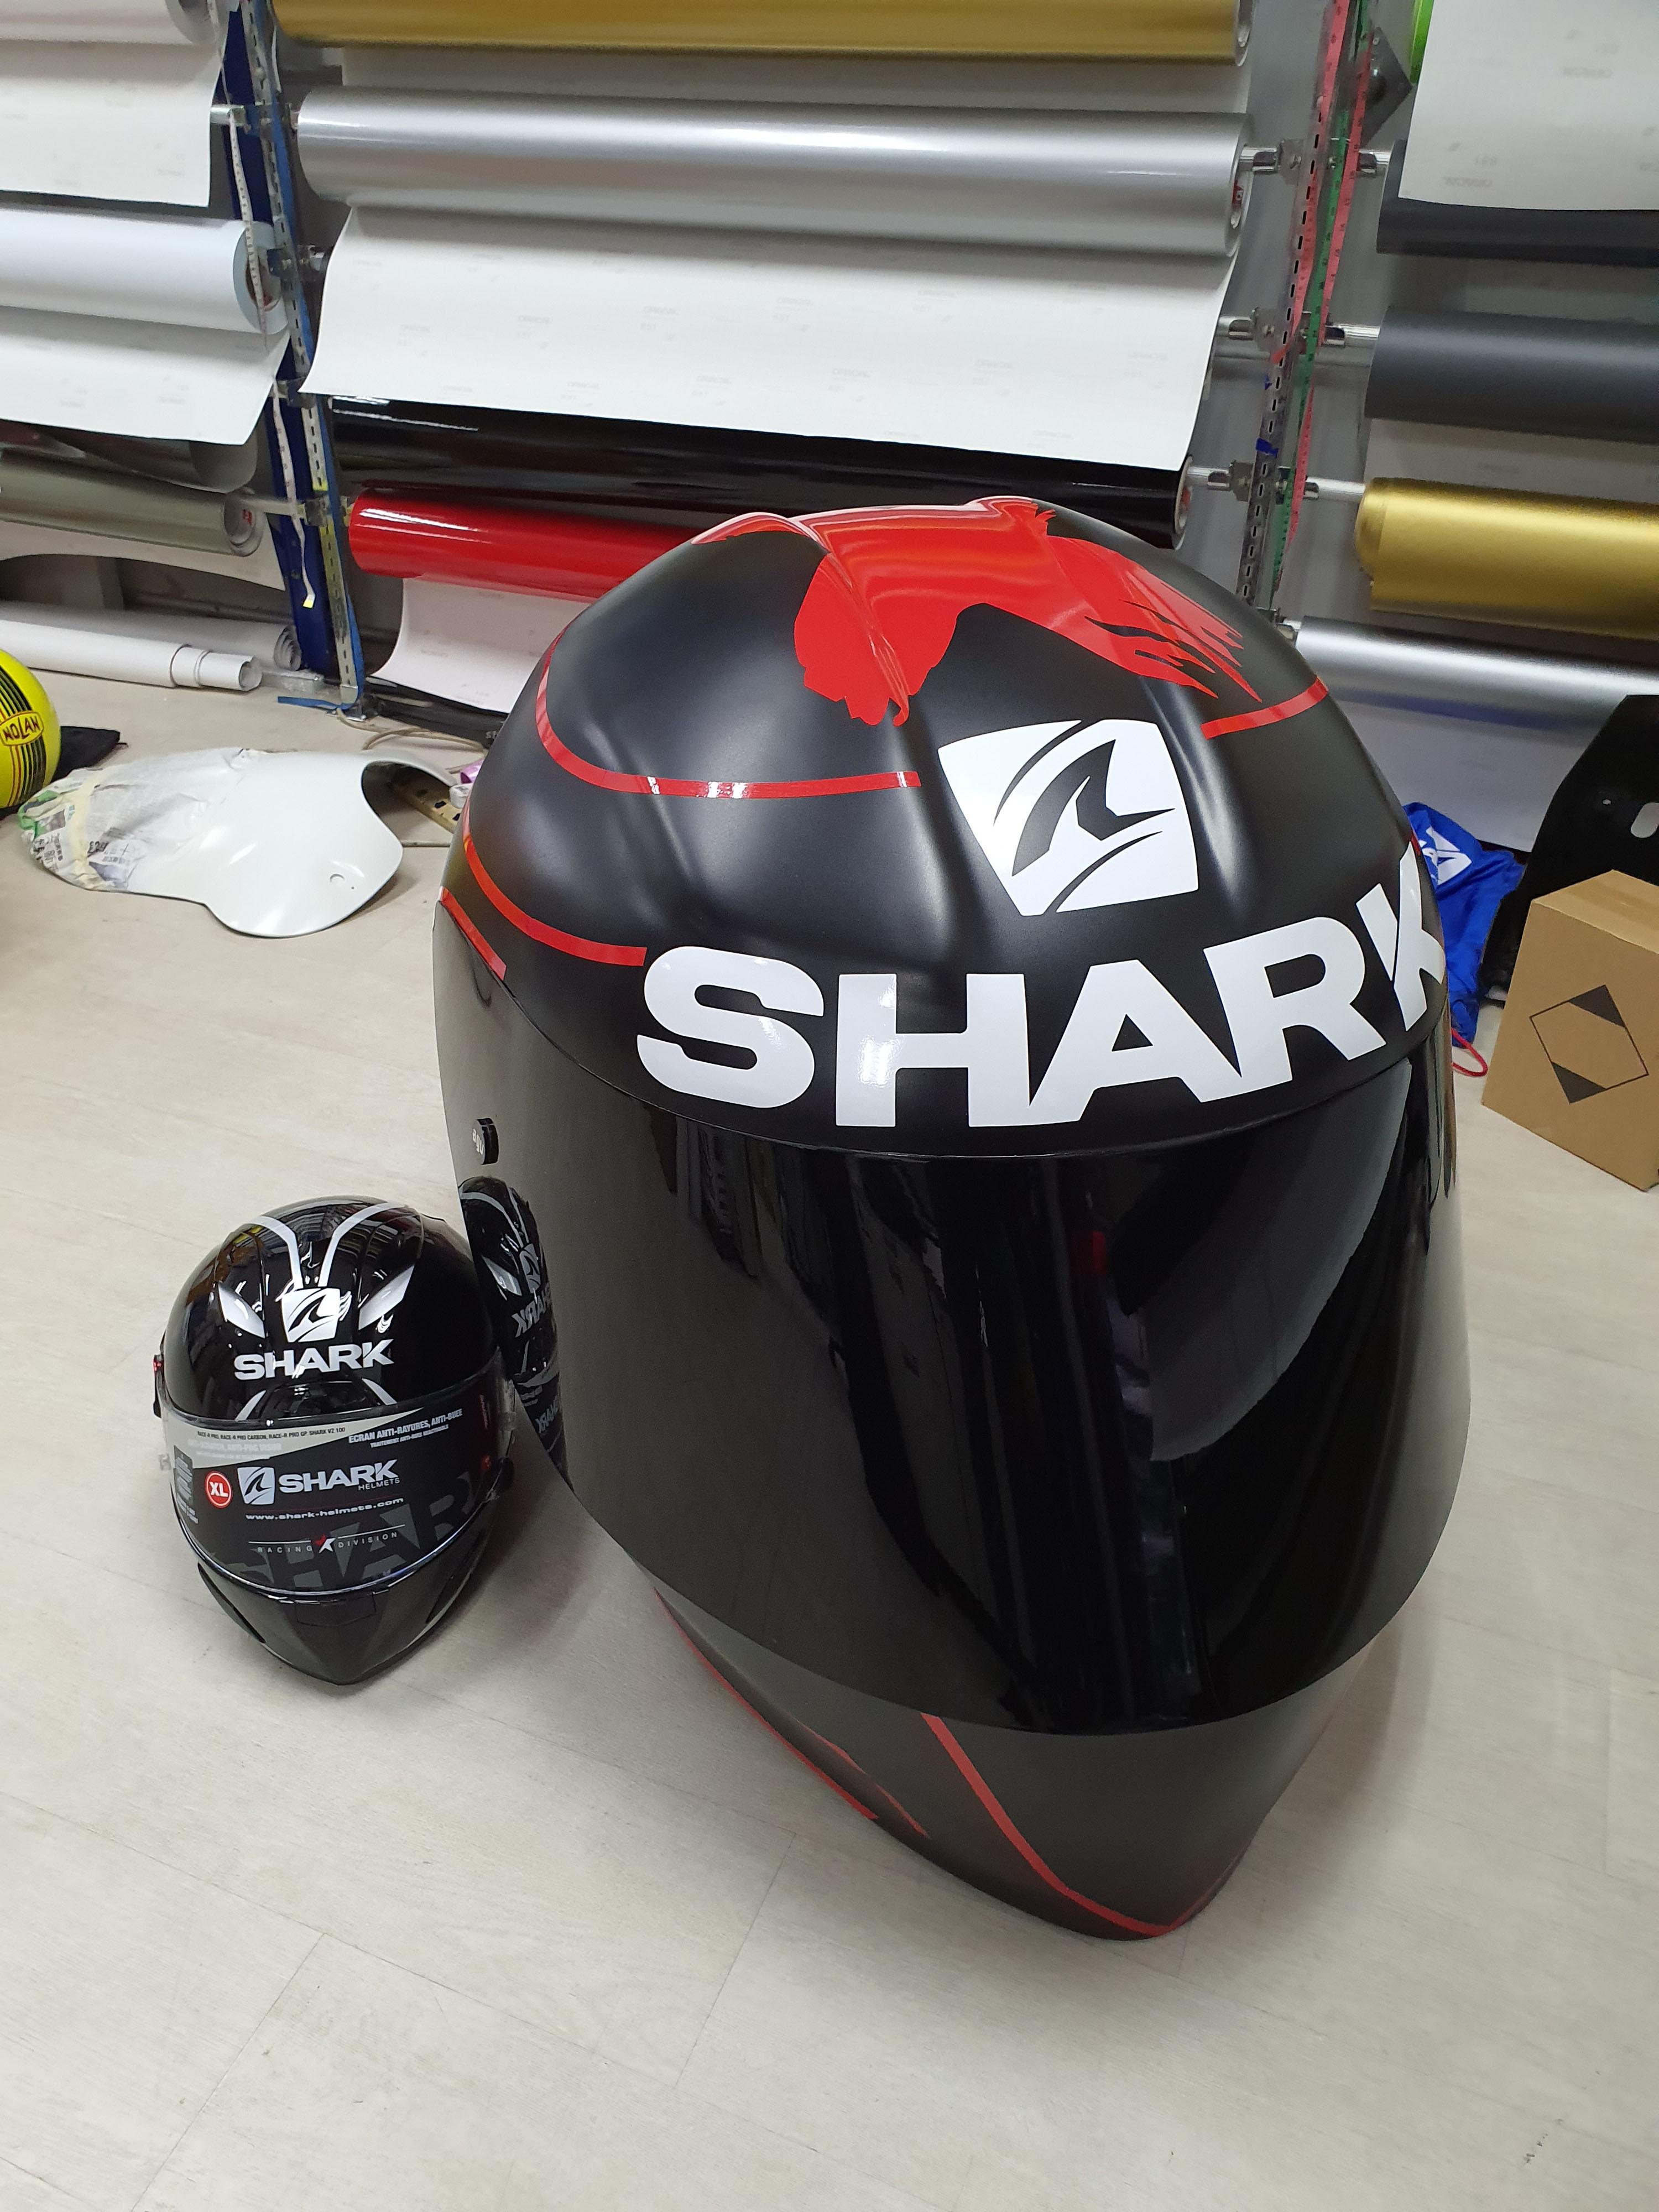 Gigantic Shark Helmet beside a normal helmet! It is at least 8 times bigger!